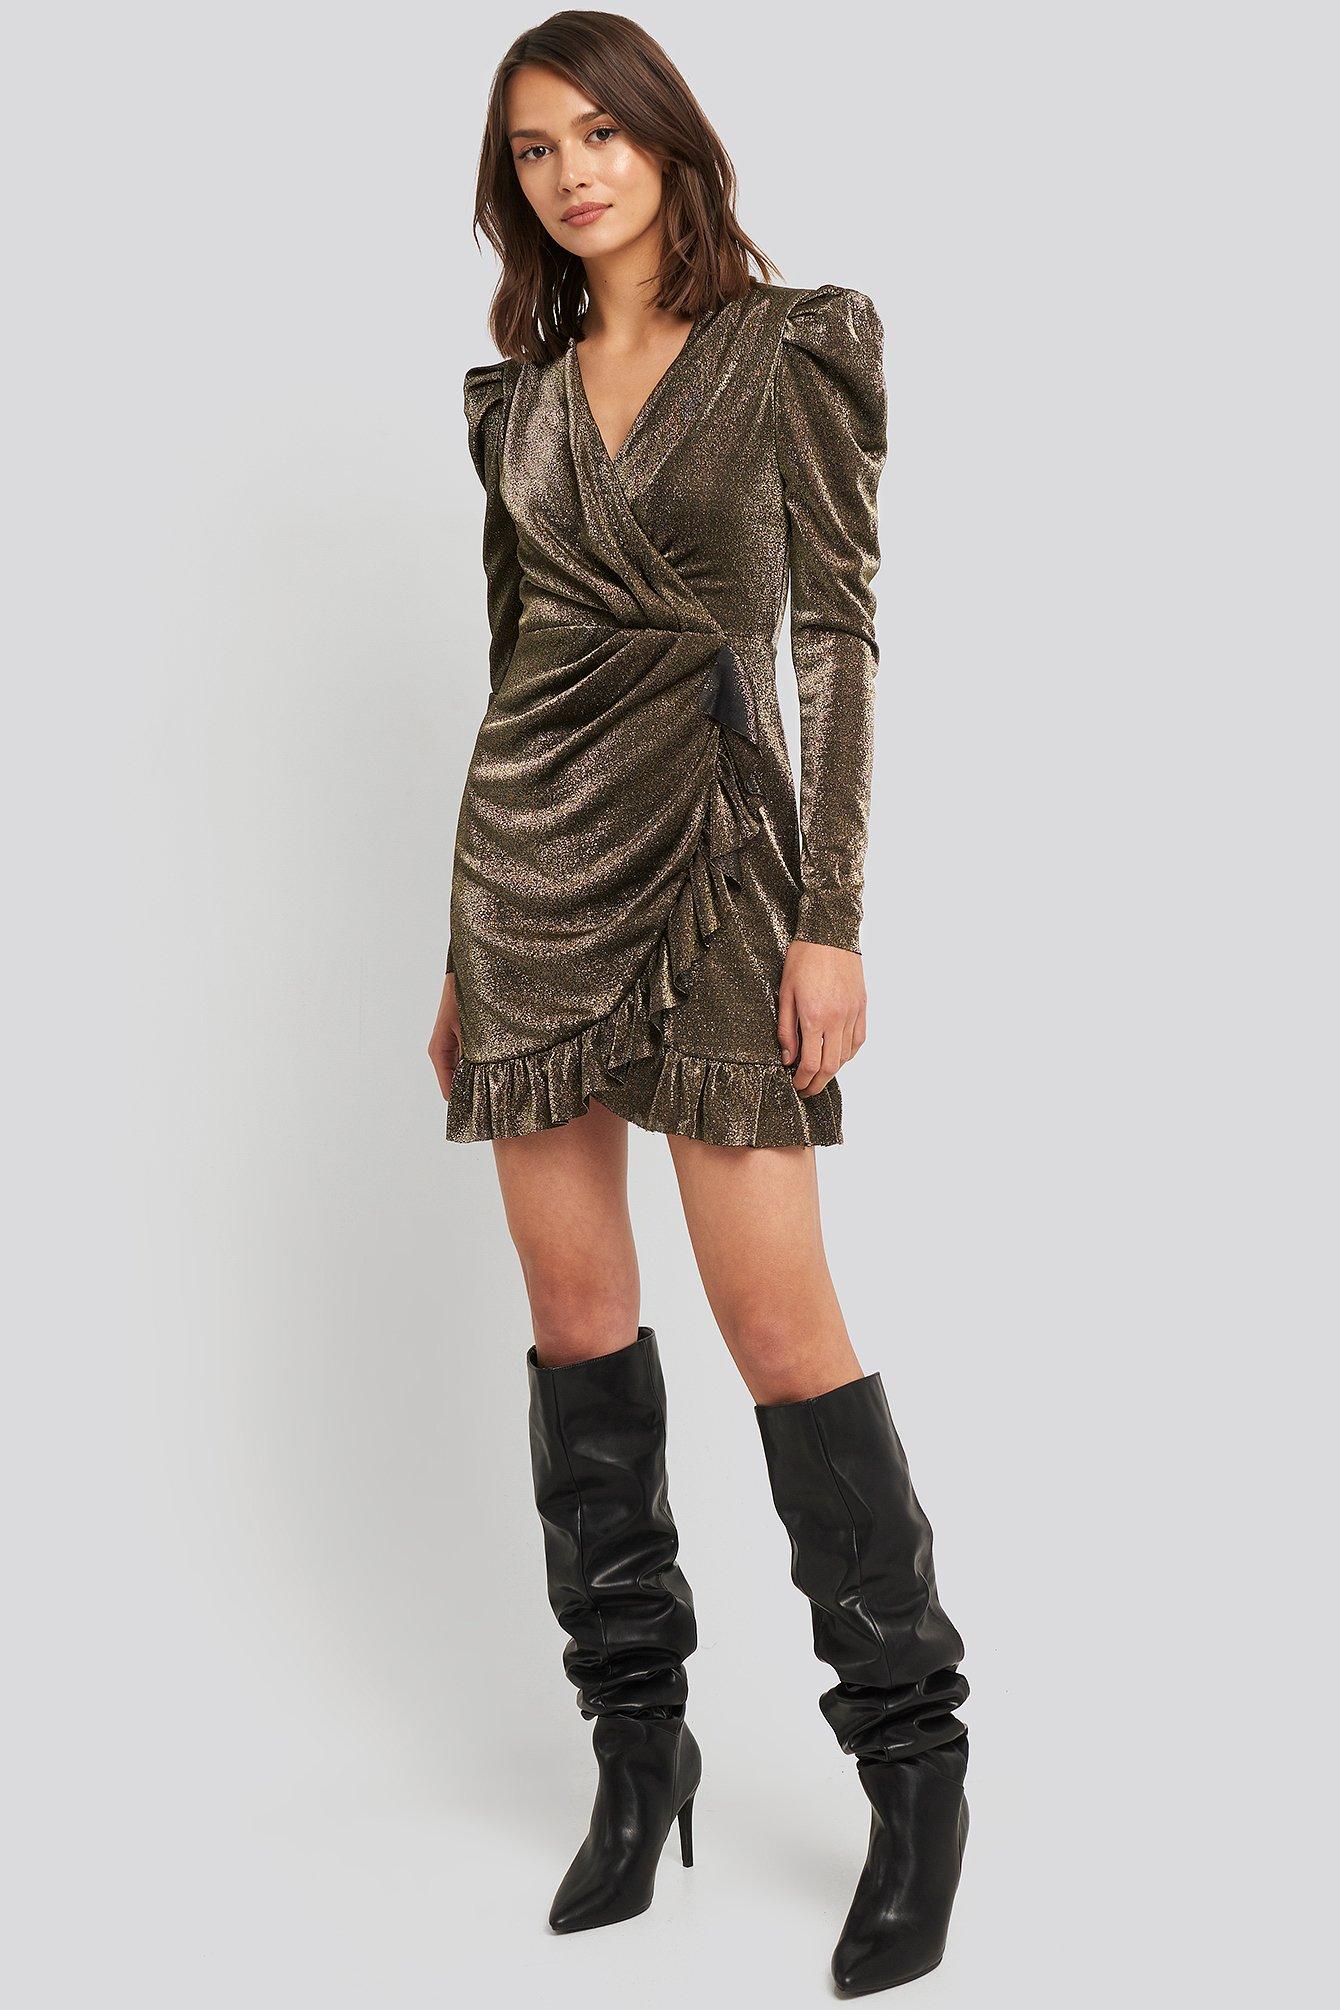 trendyol -  Bronze Flywheel Detailed Dress - Copper